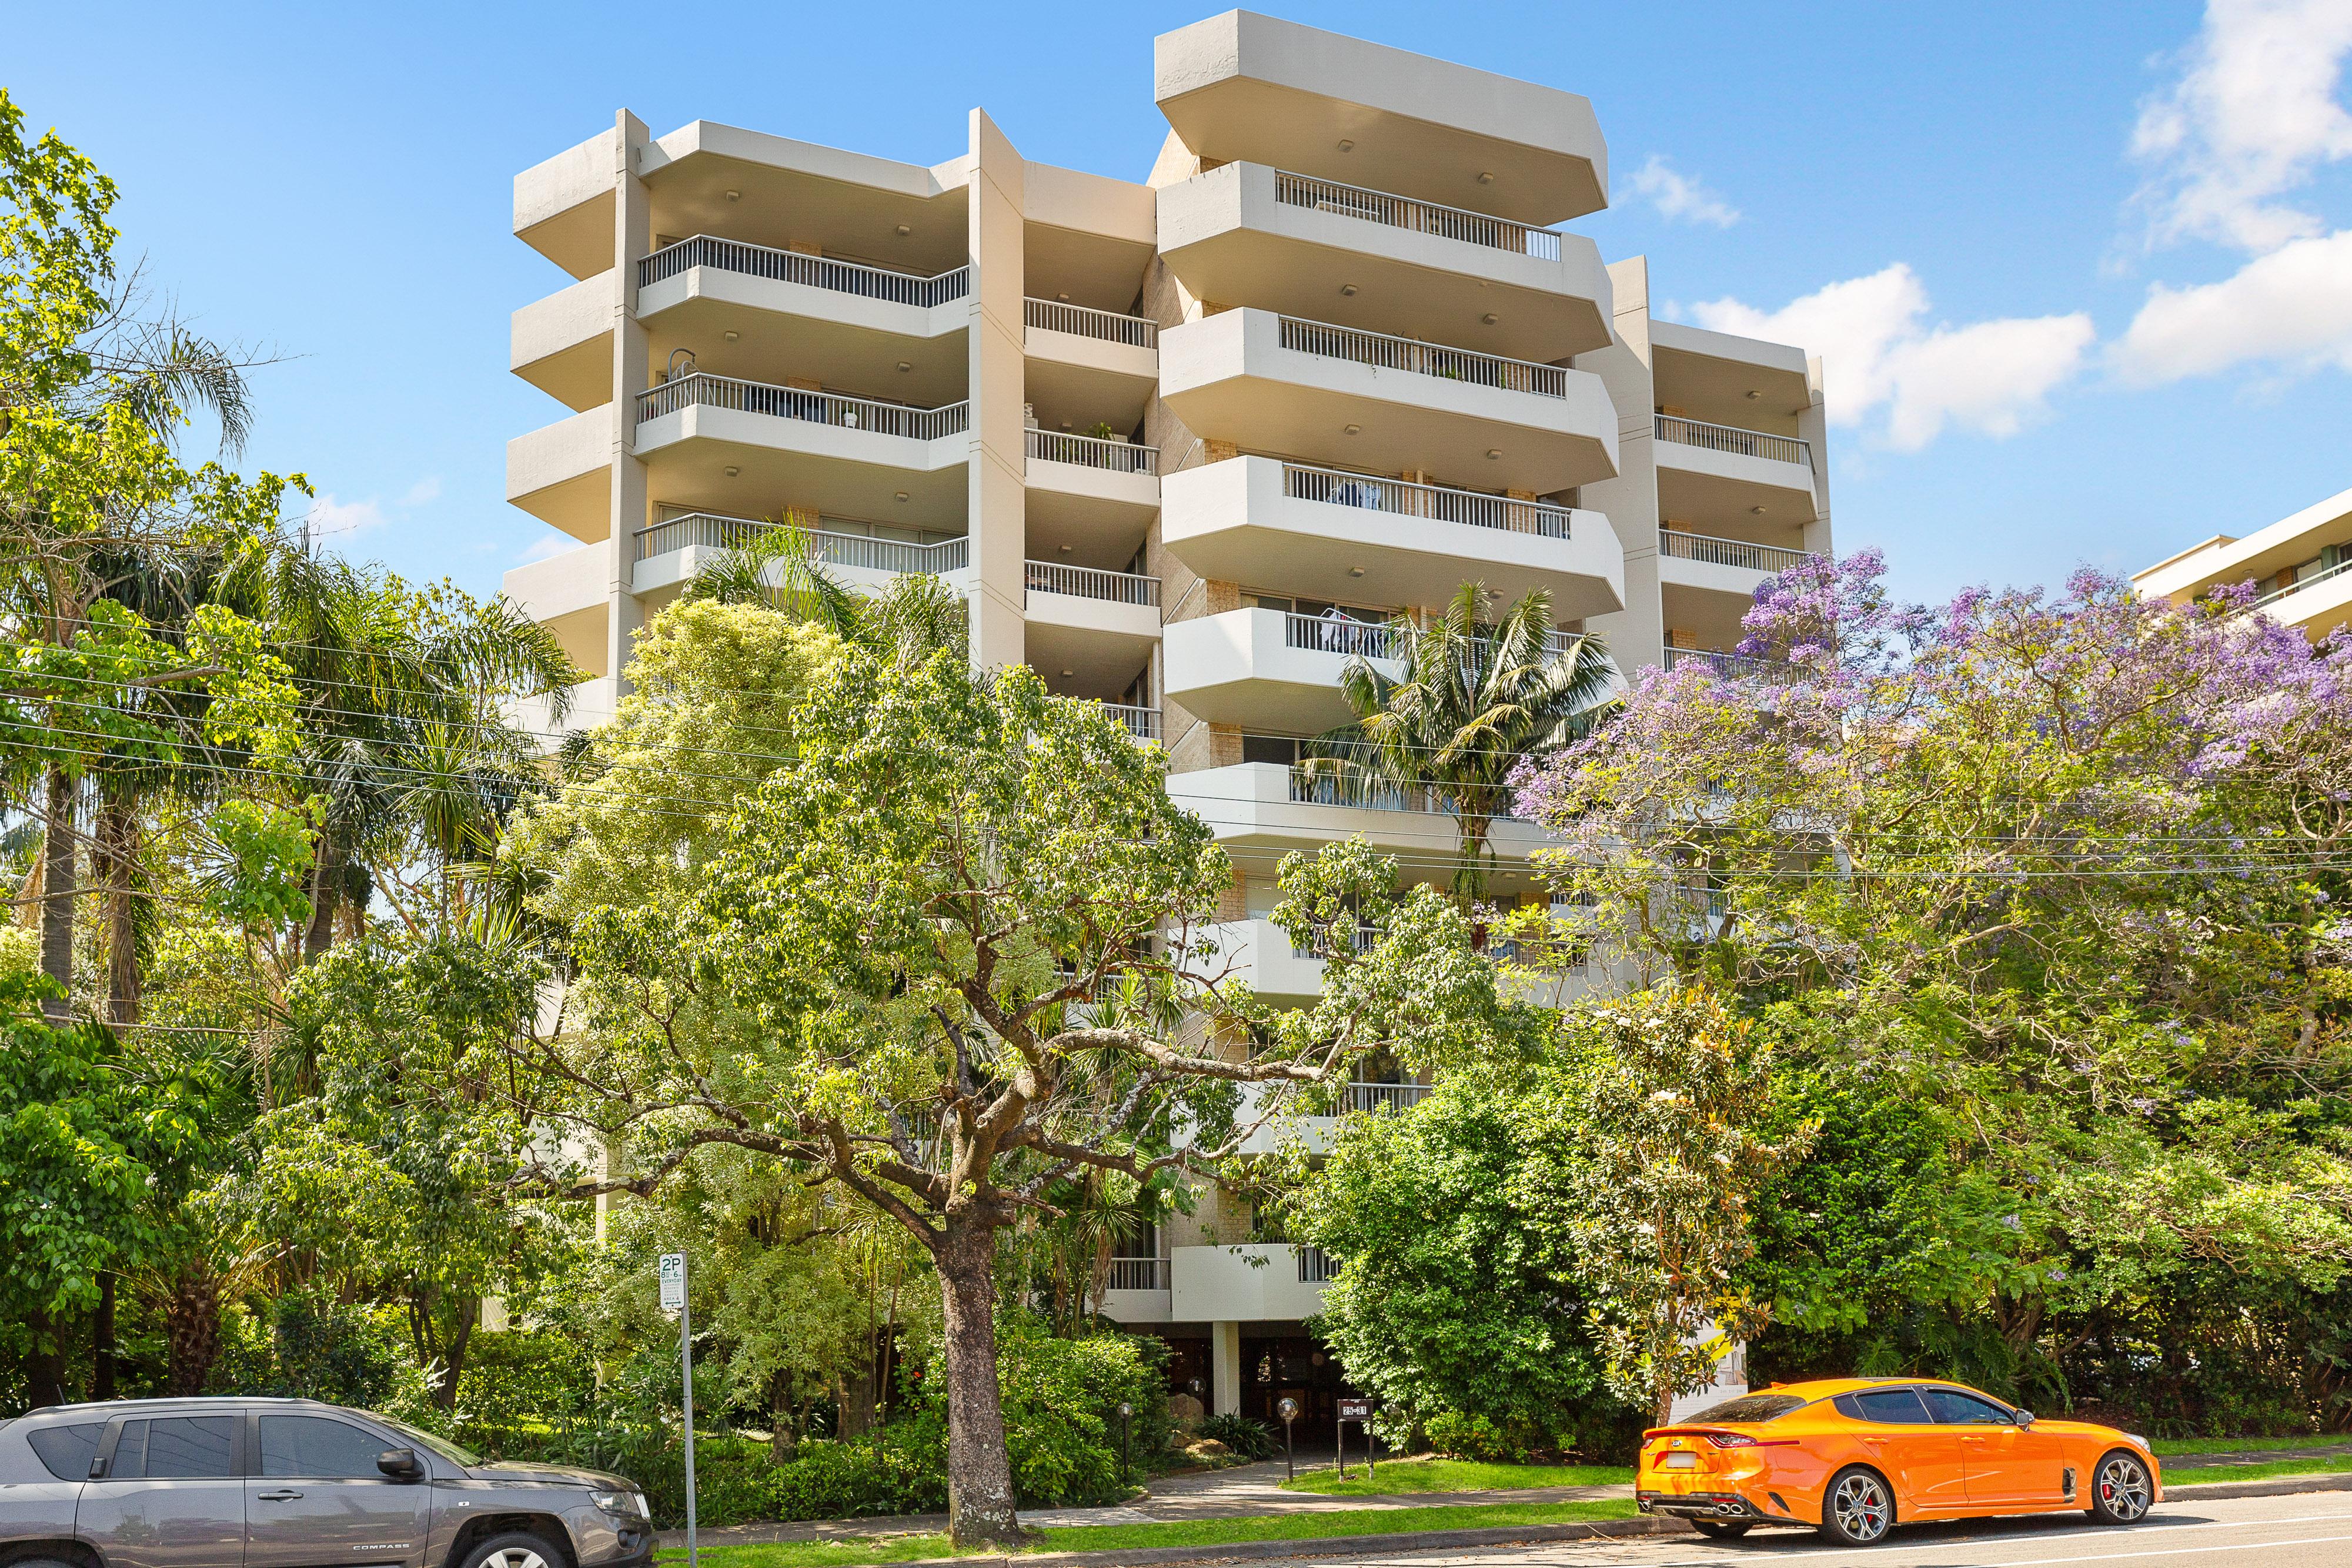 15/25-31 Johnson Street, Chatswood, NSW 2067